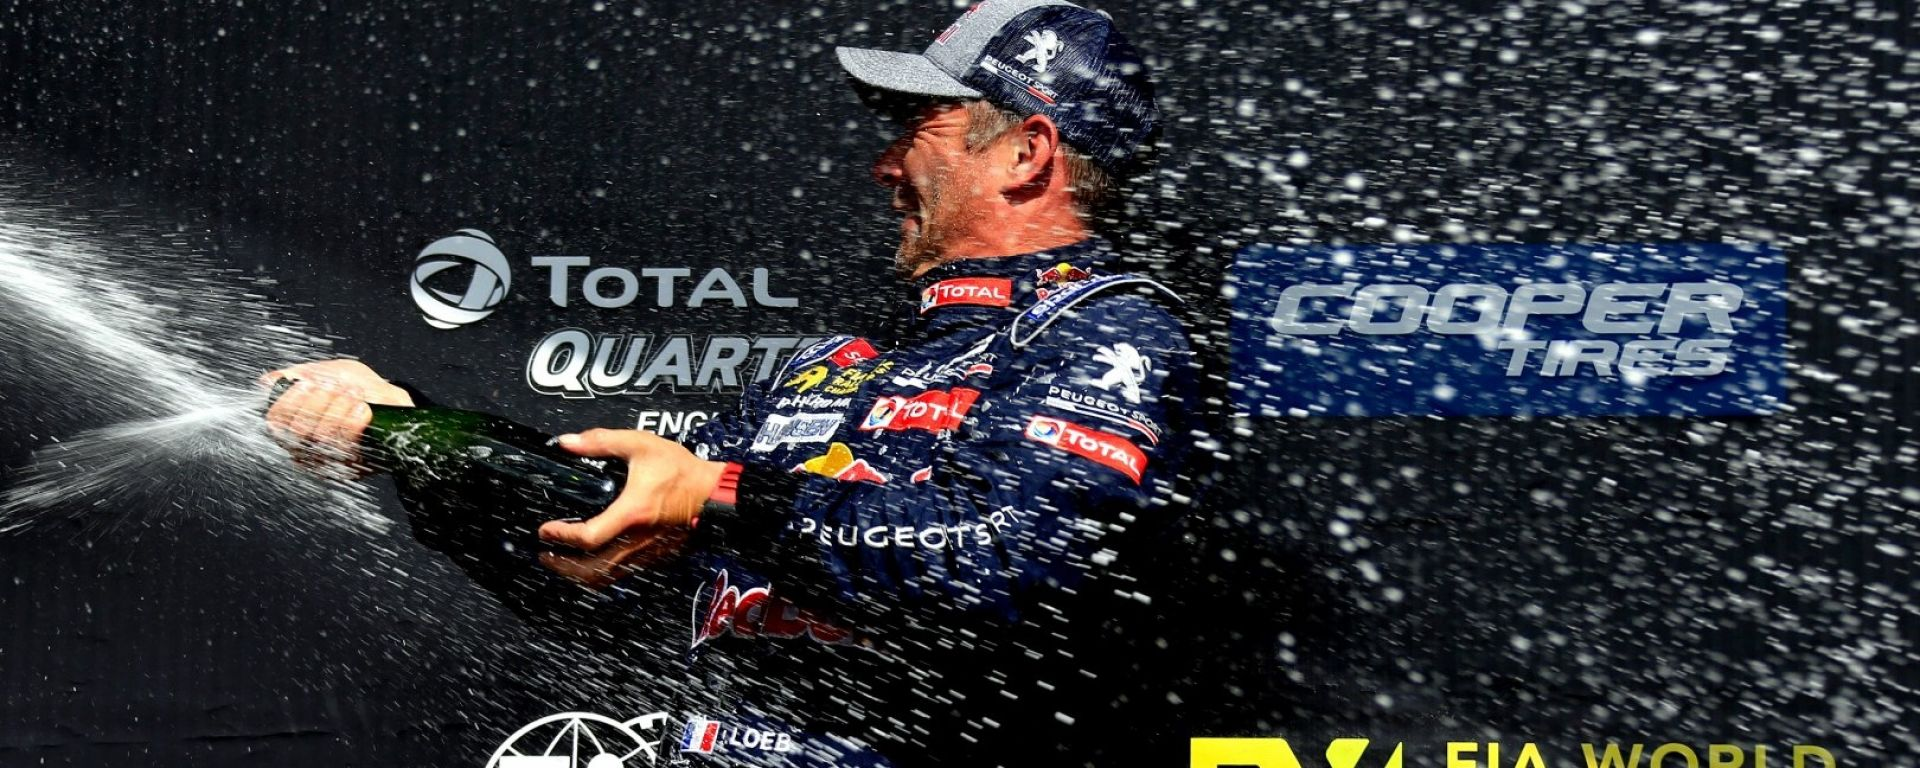 Sebastien Loeb - GP Holjes, Rallycross 2017